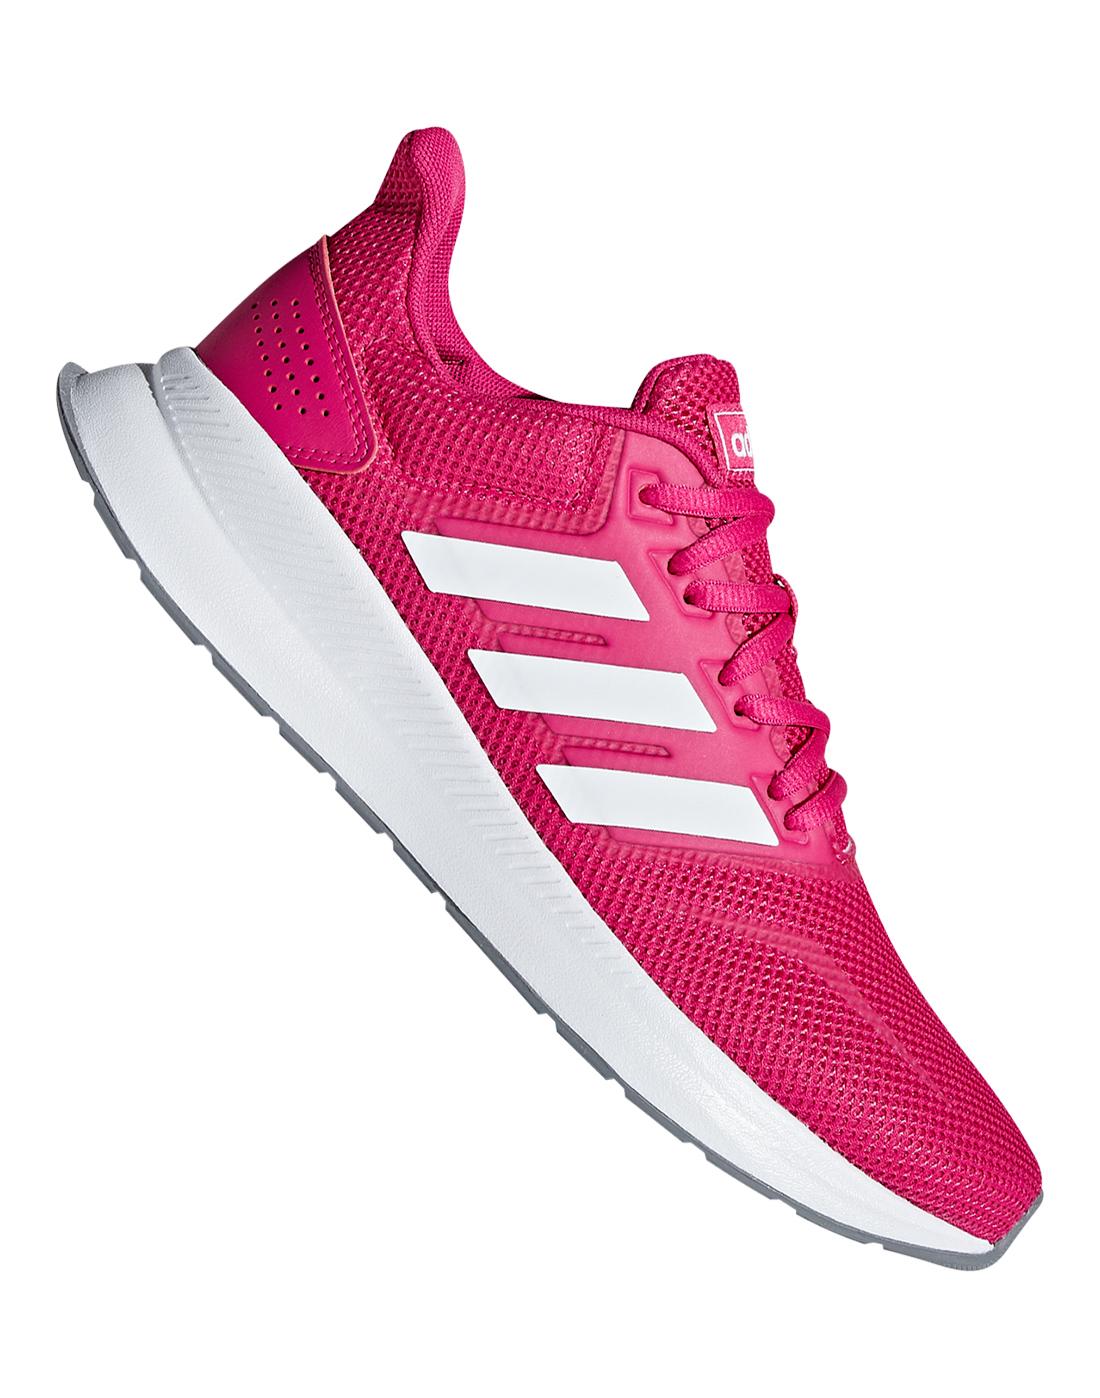 Women's Pink adidas Falcon | Life Style